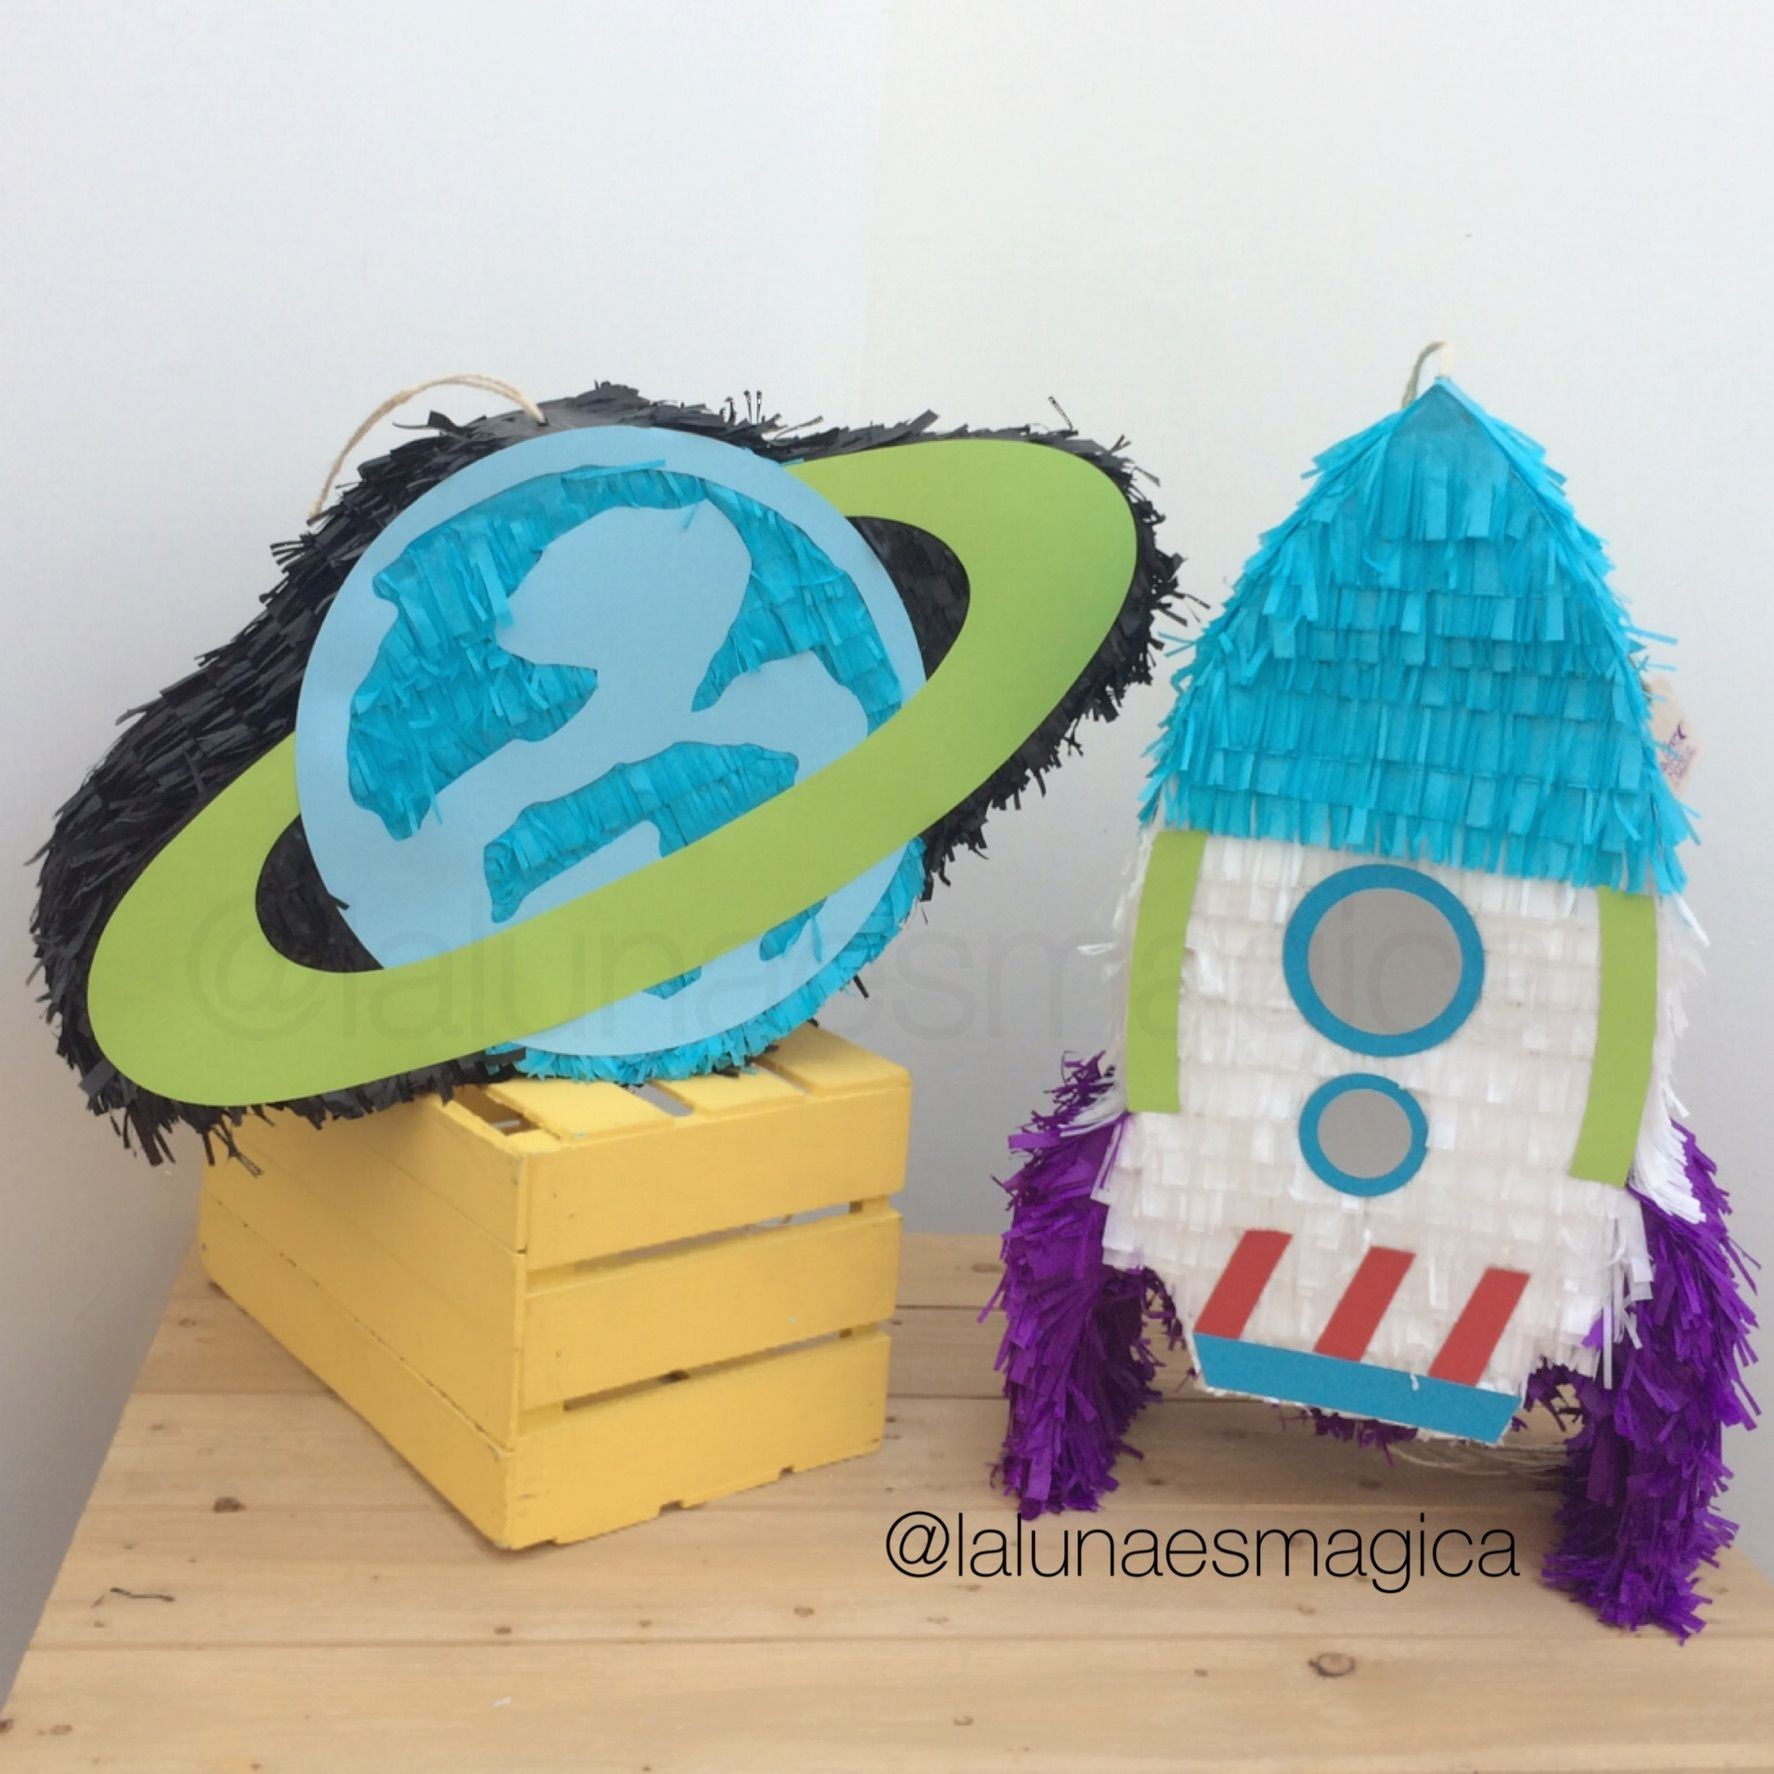 Piñata At Lalunaesmagica Piñata Planeta Y Cohete Buzz Light